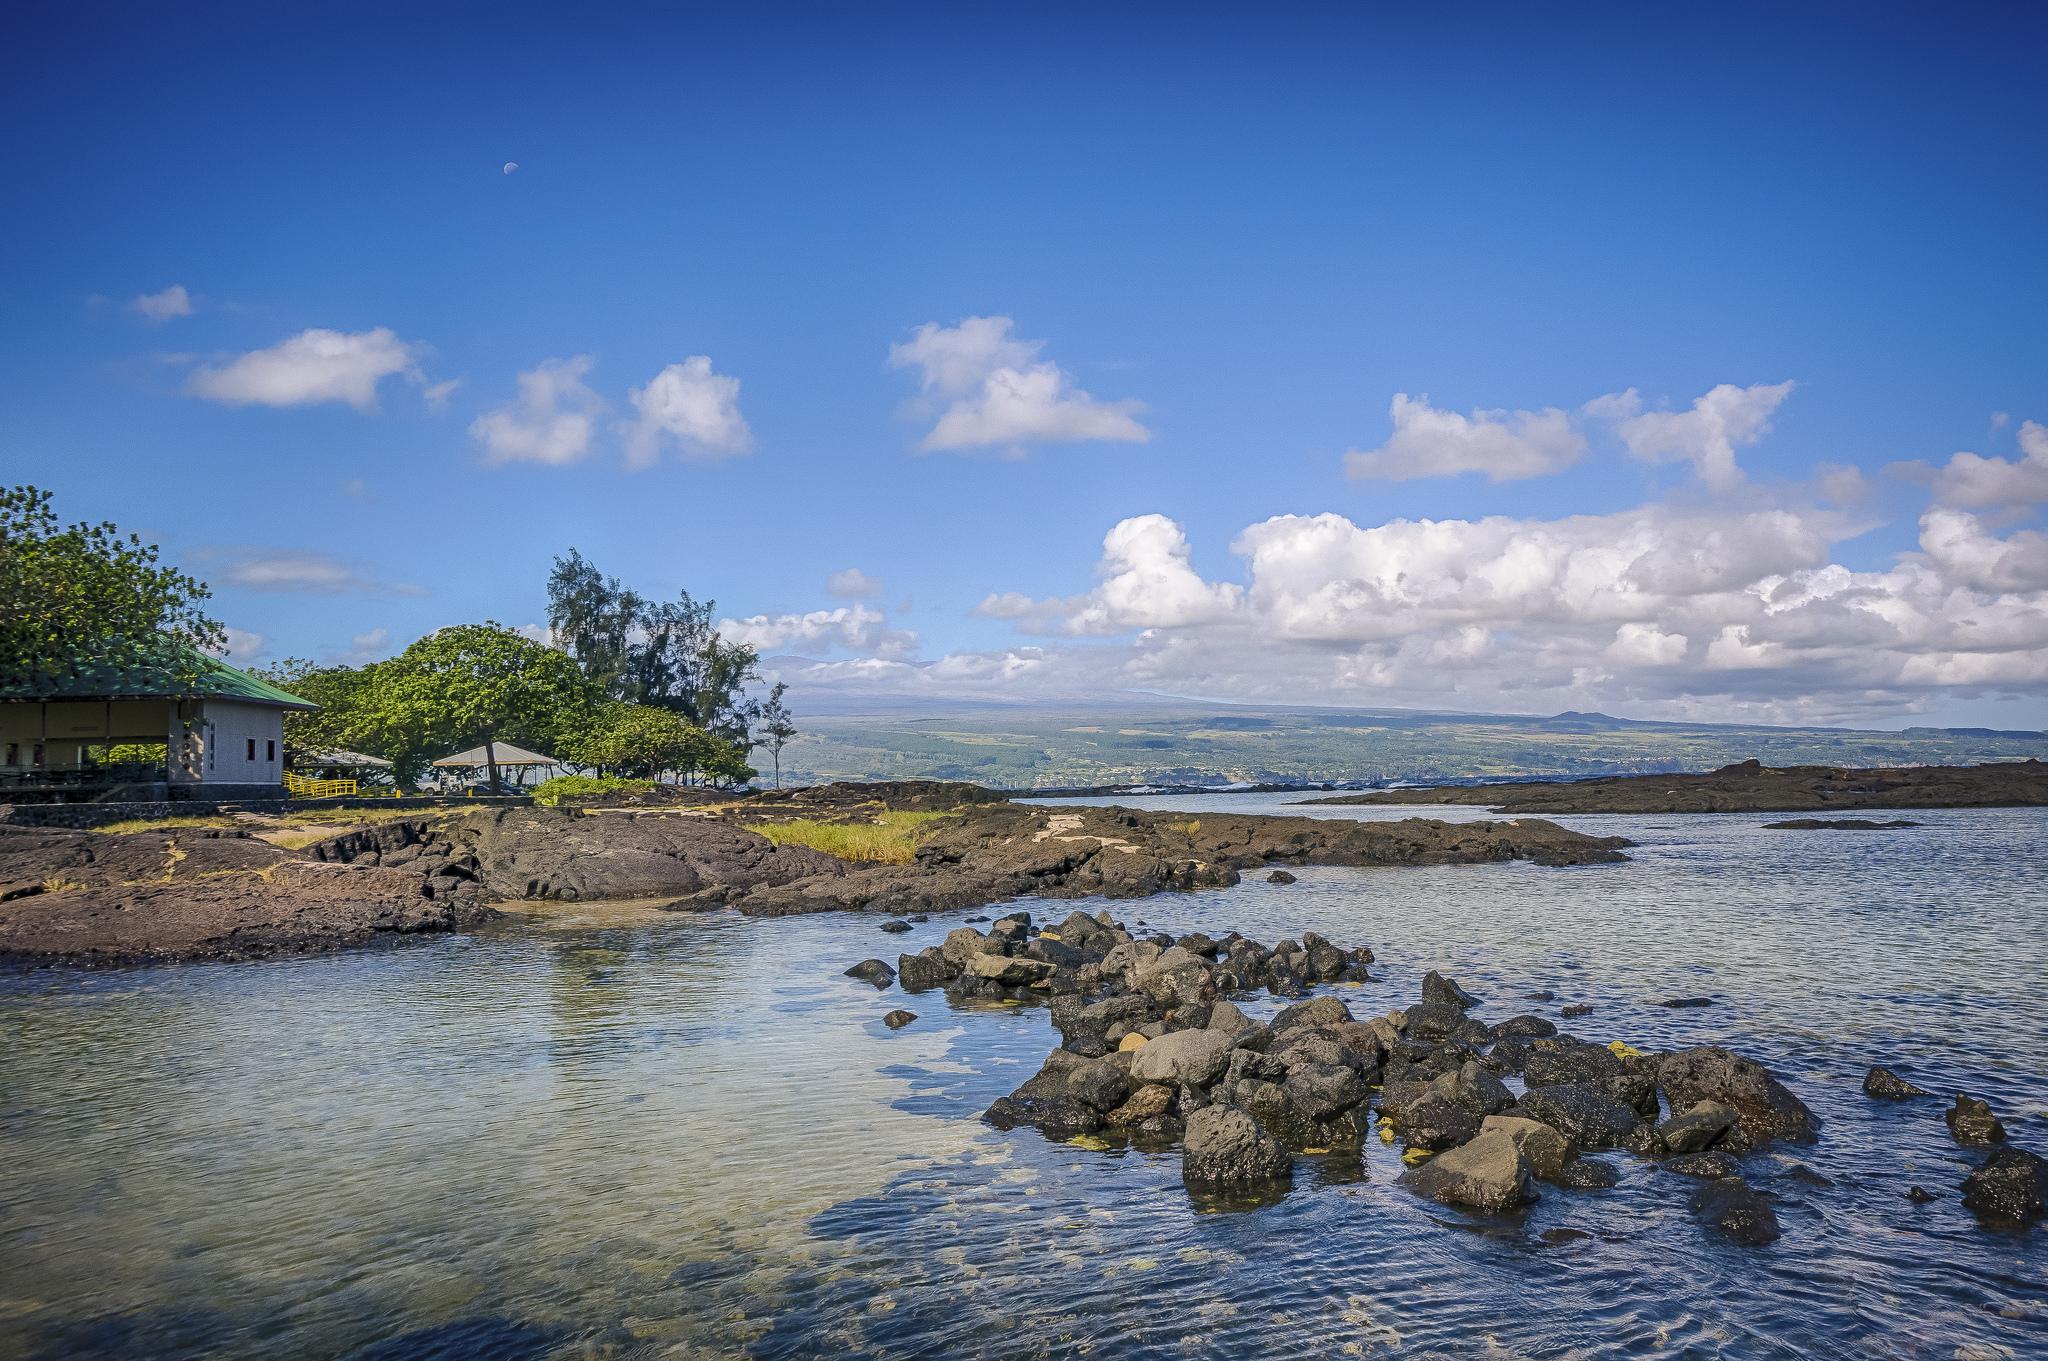 Land für Verkauf beim 1391 Kalanianaole St. 1391 Kalanianaole St. 176 Apapane Rd., , lot #9 Hilo, Hawaii 96720 Vereinigte Staaten